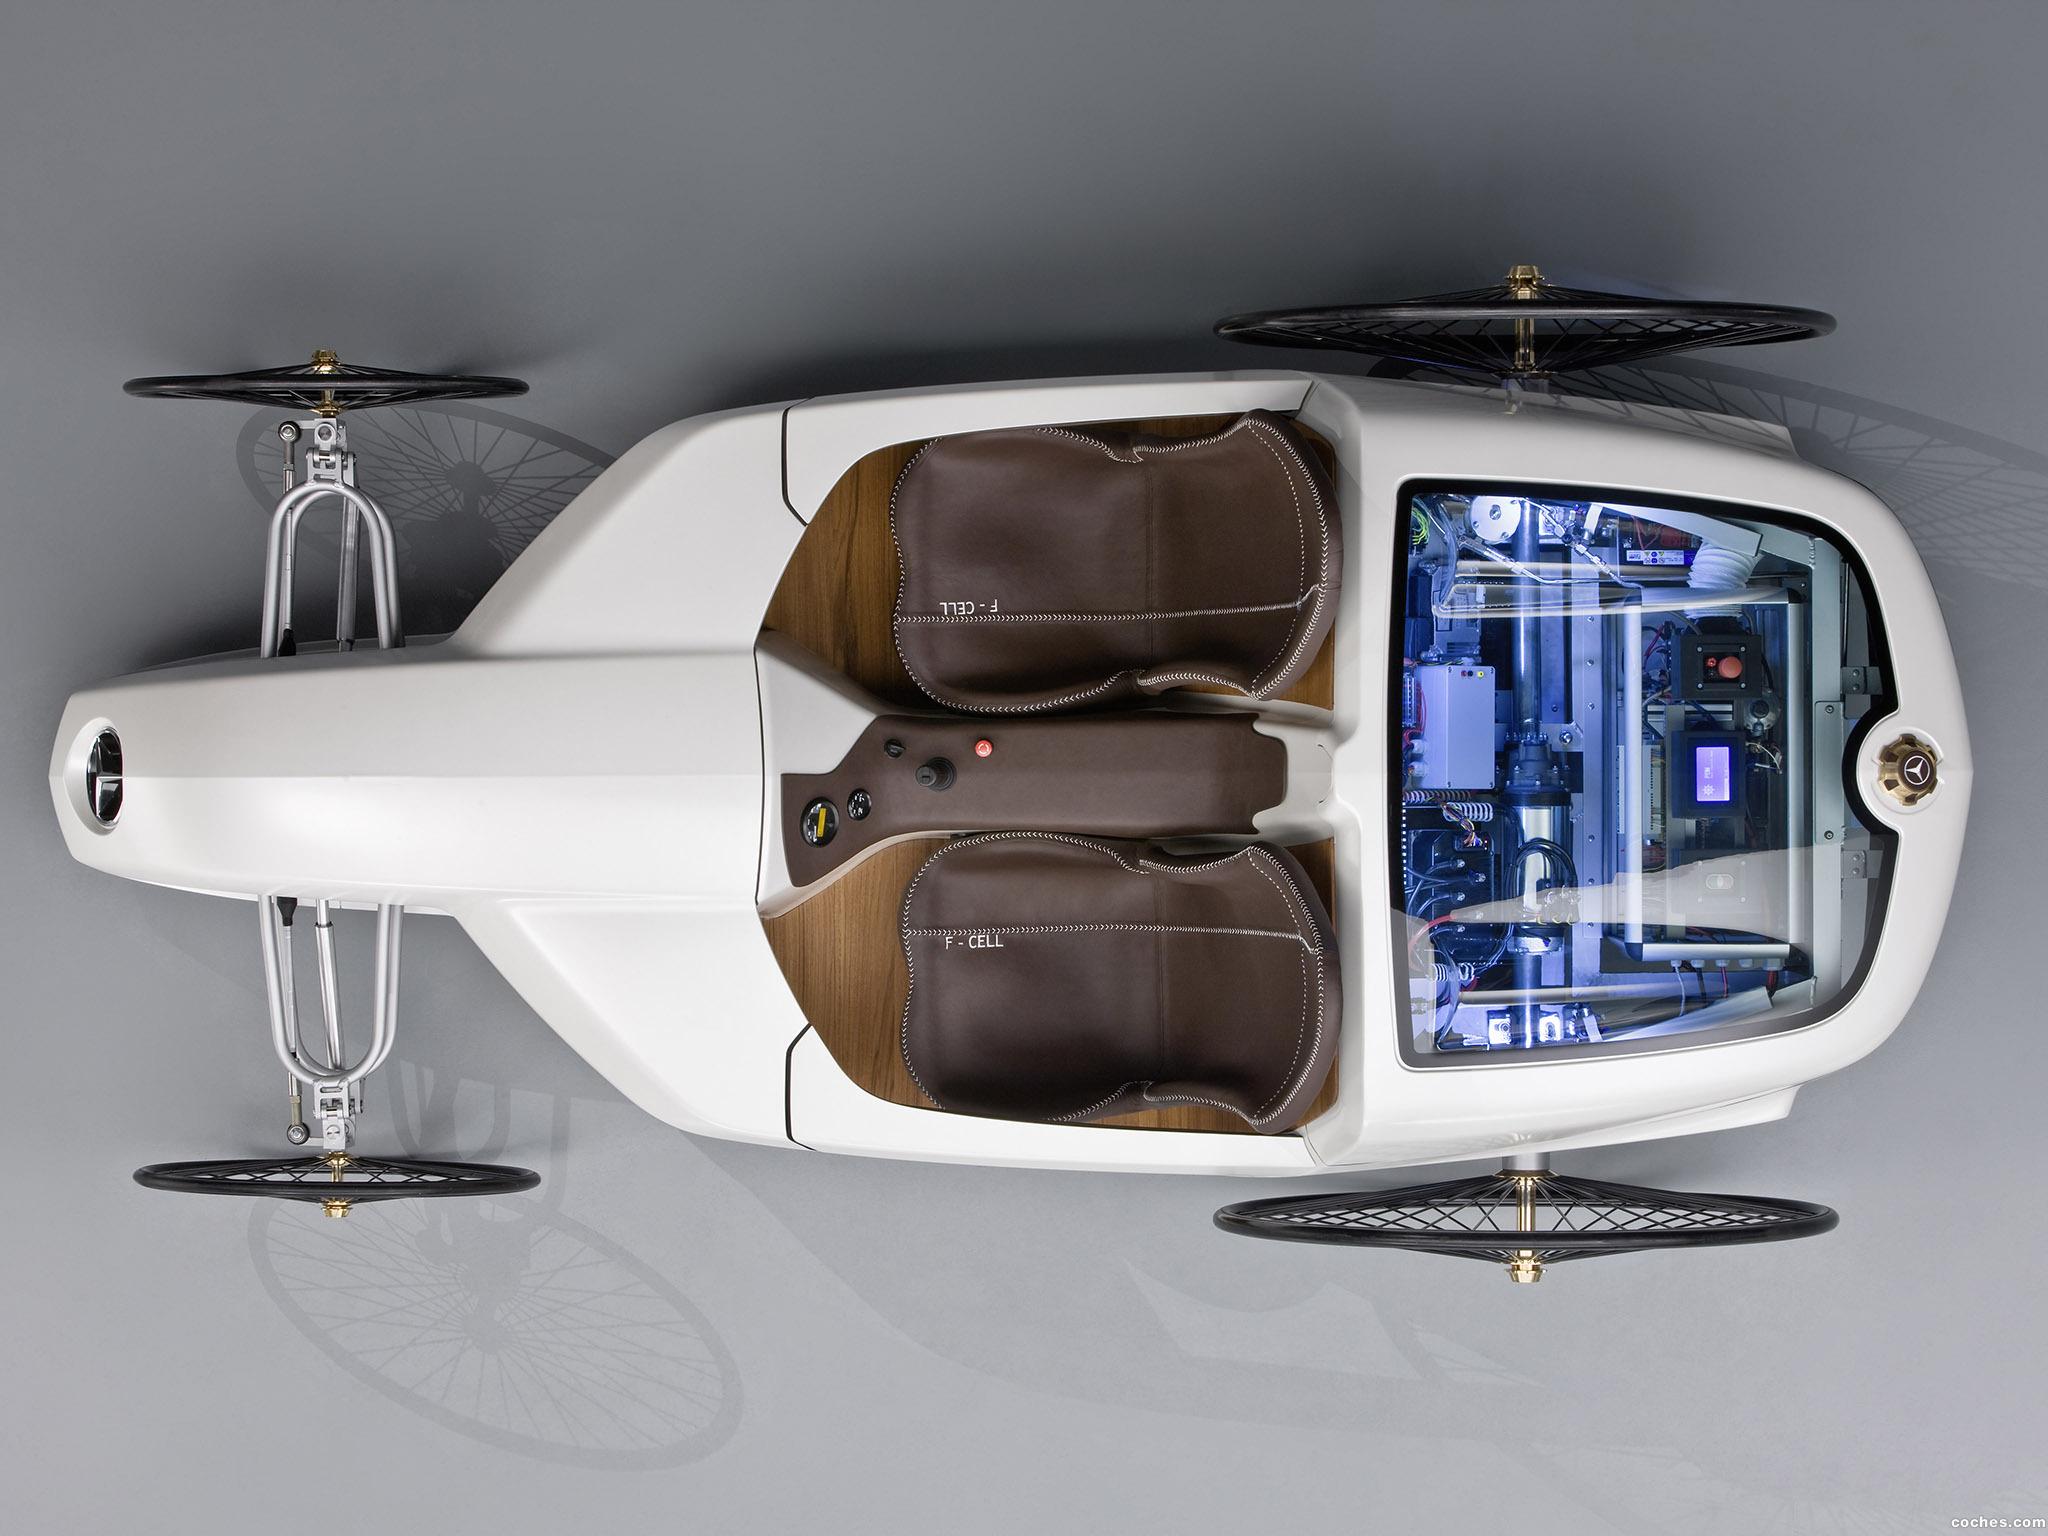 Foto 1 de Mercedes F-CELL Roadster Concept 2009